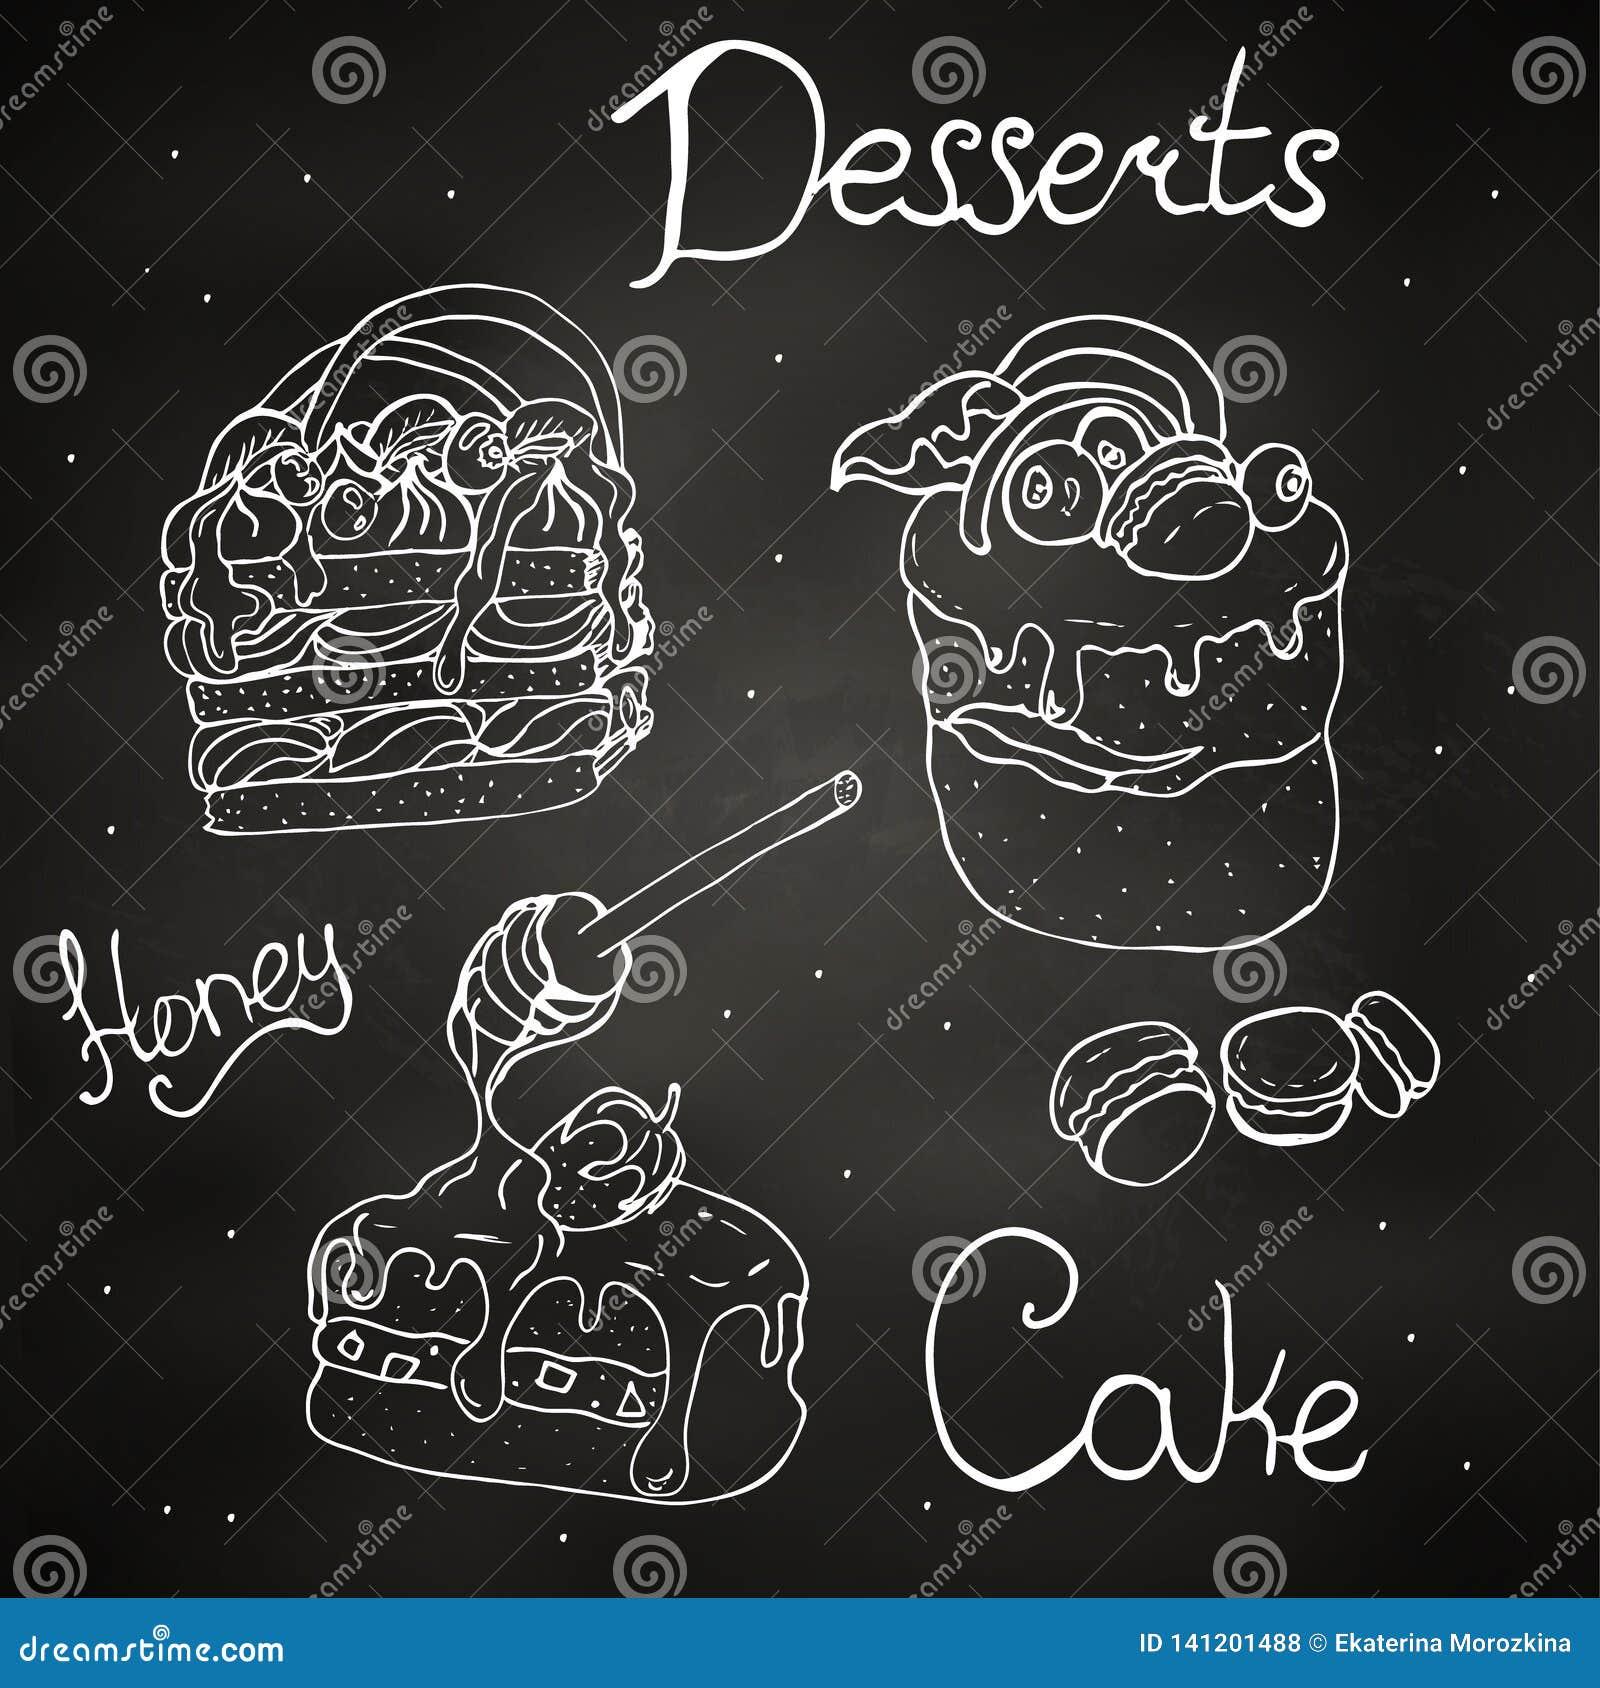 Dessert, fruit on a stick in chocolate.illustration,